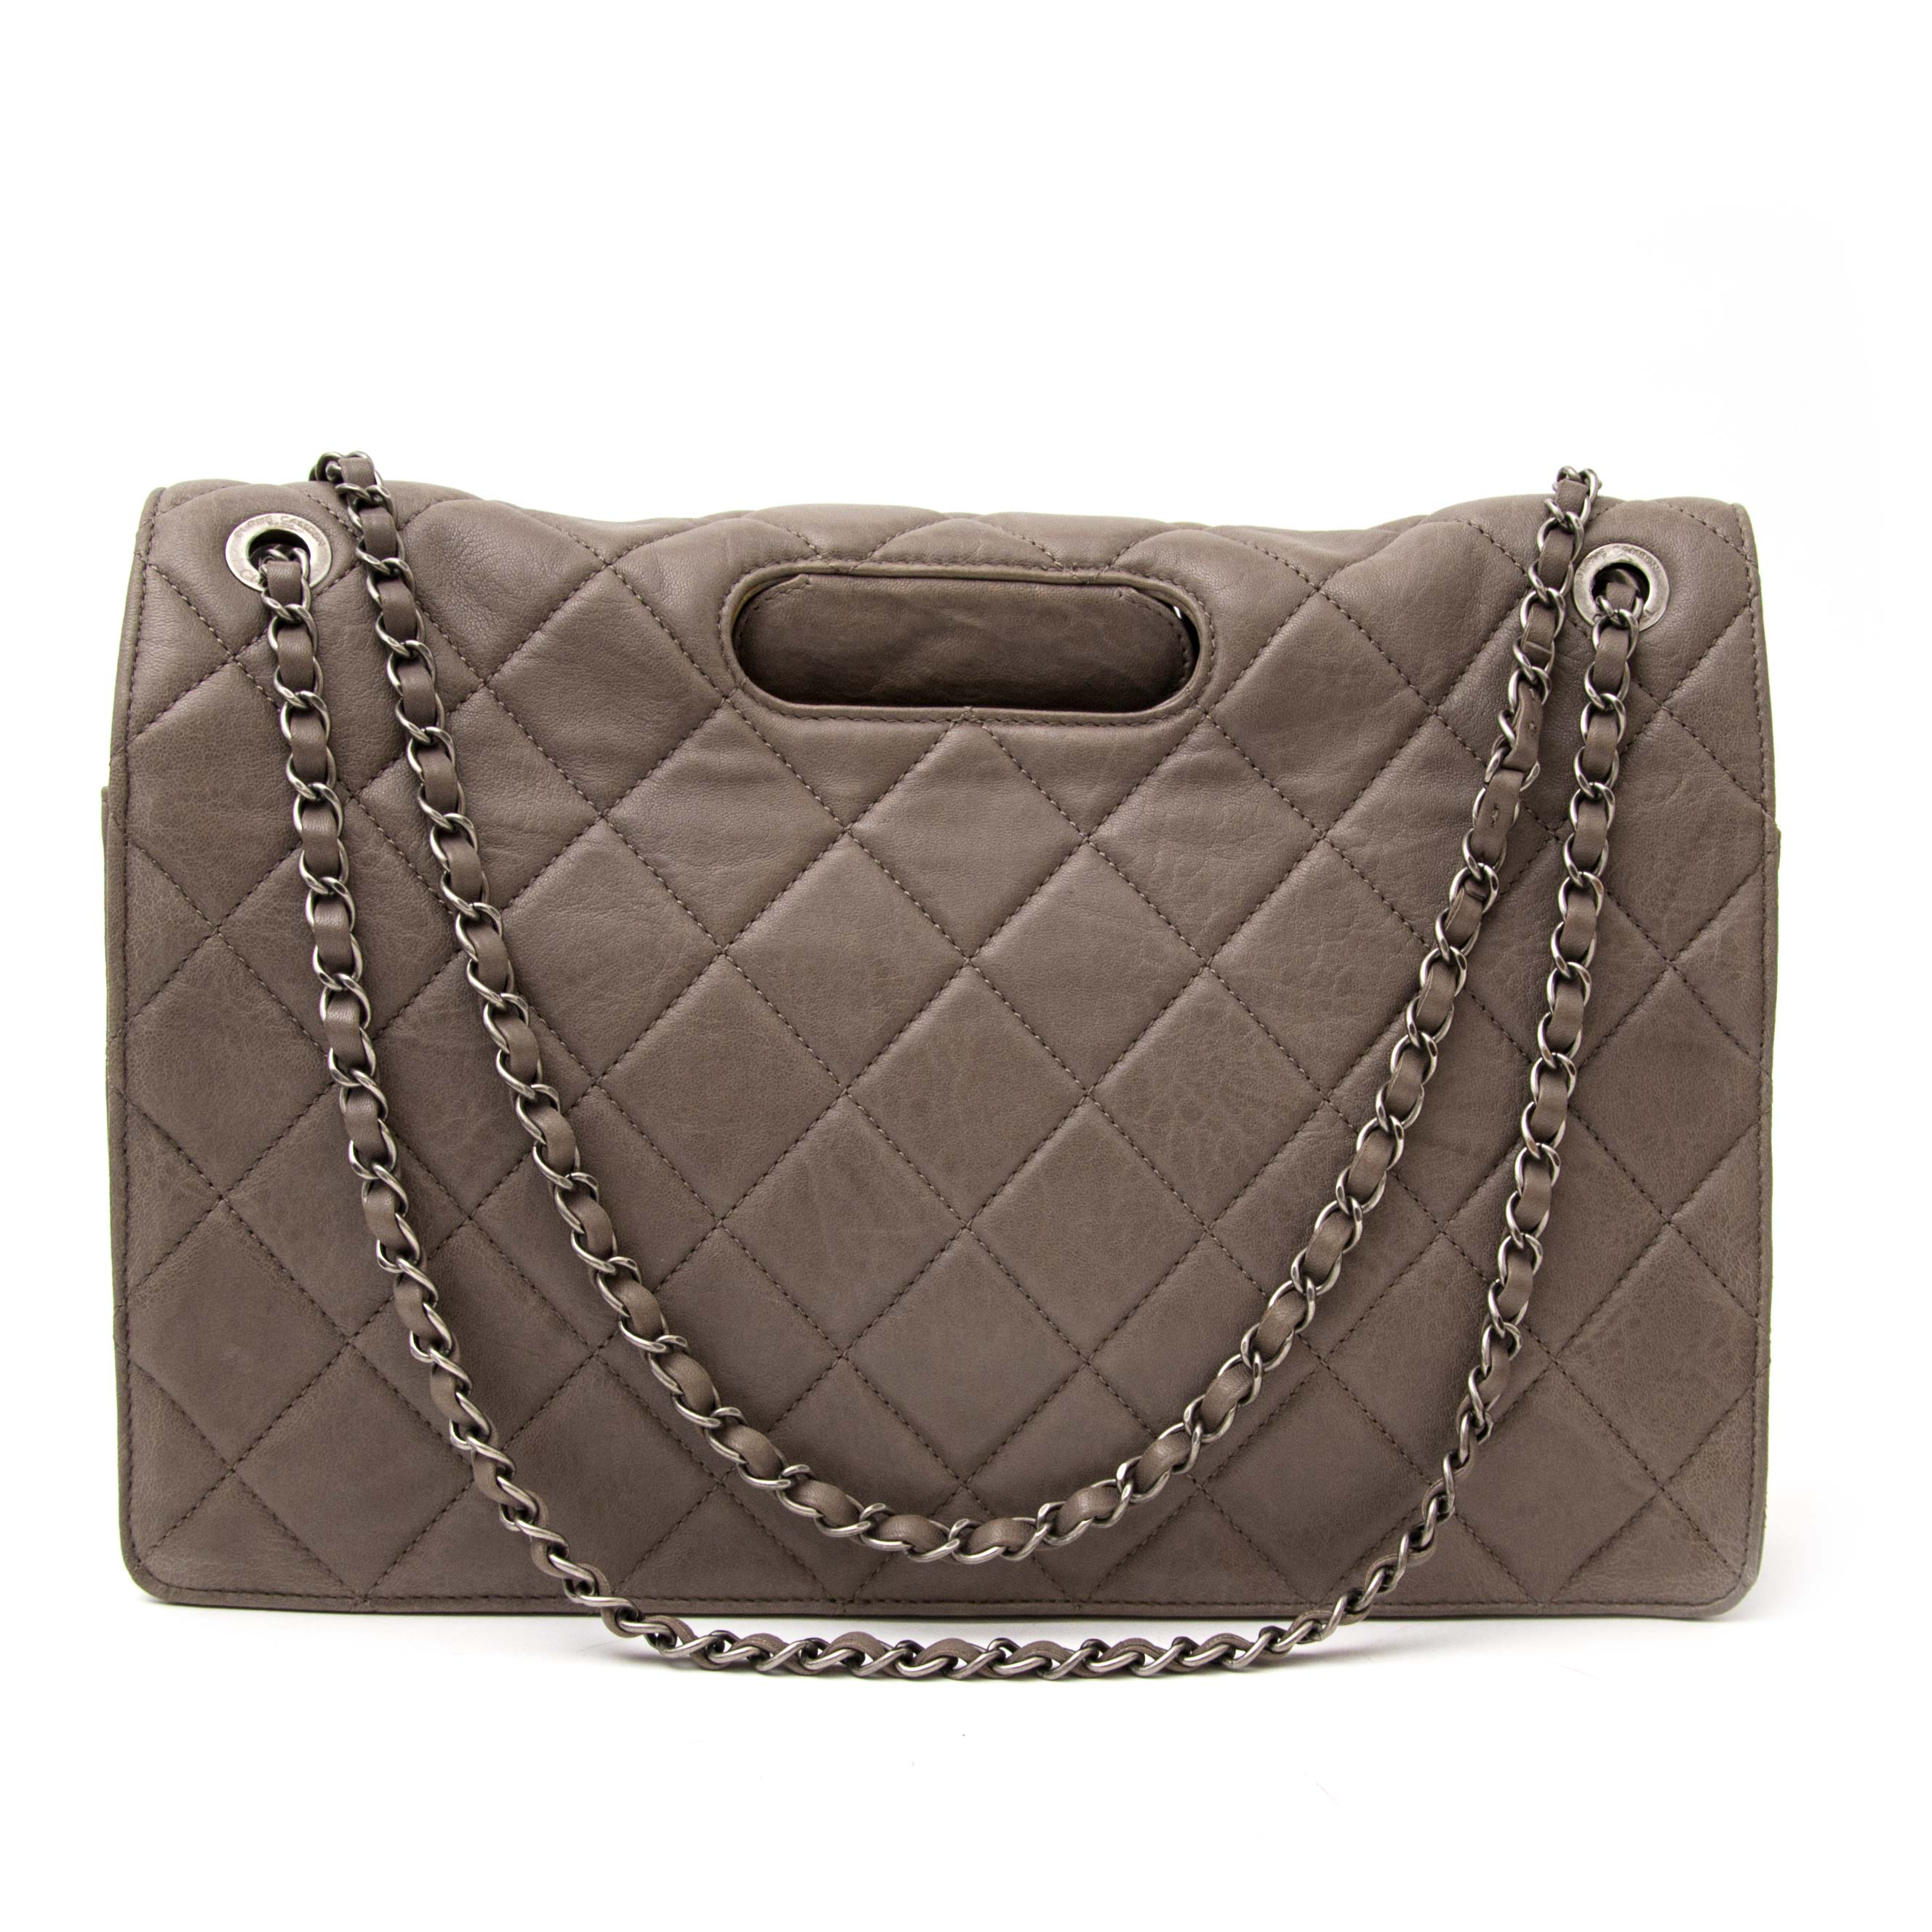 59776dca0b81 ... shop safe online aan de beste prijs Chanel Taupe Leather 2 way Handle Flap  Bag